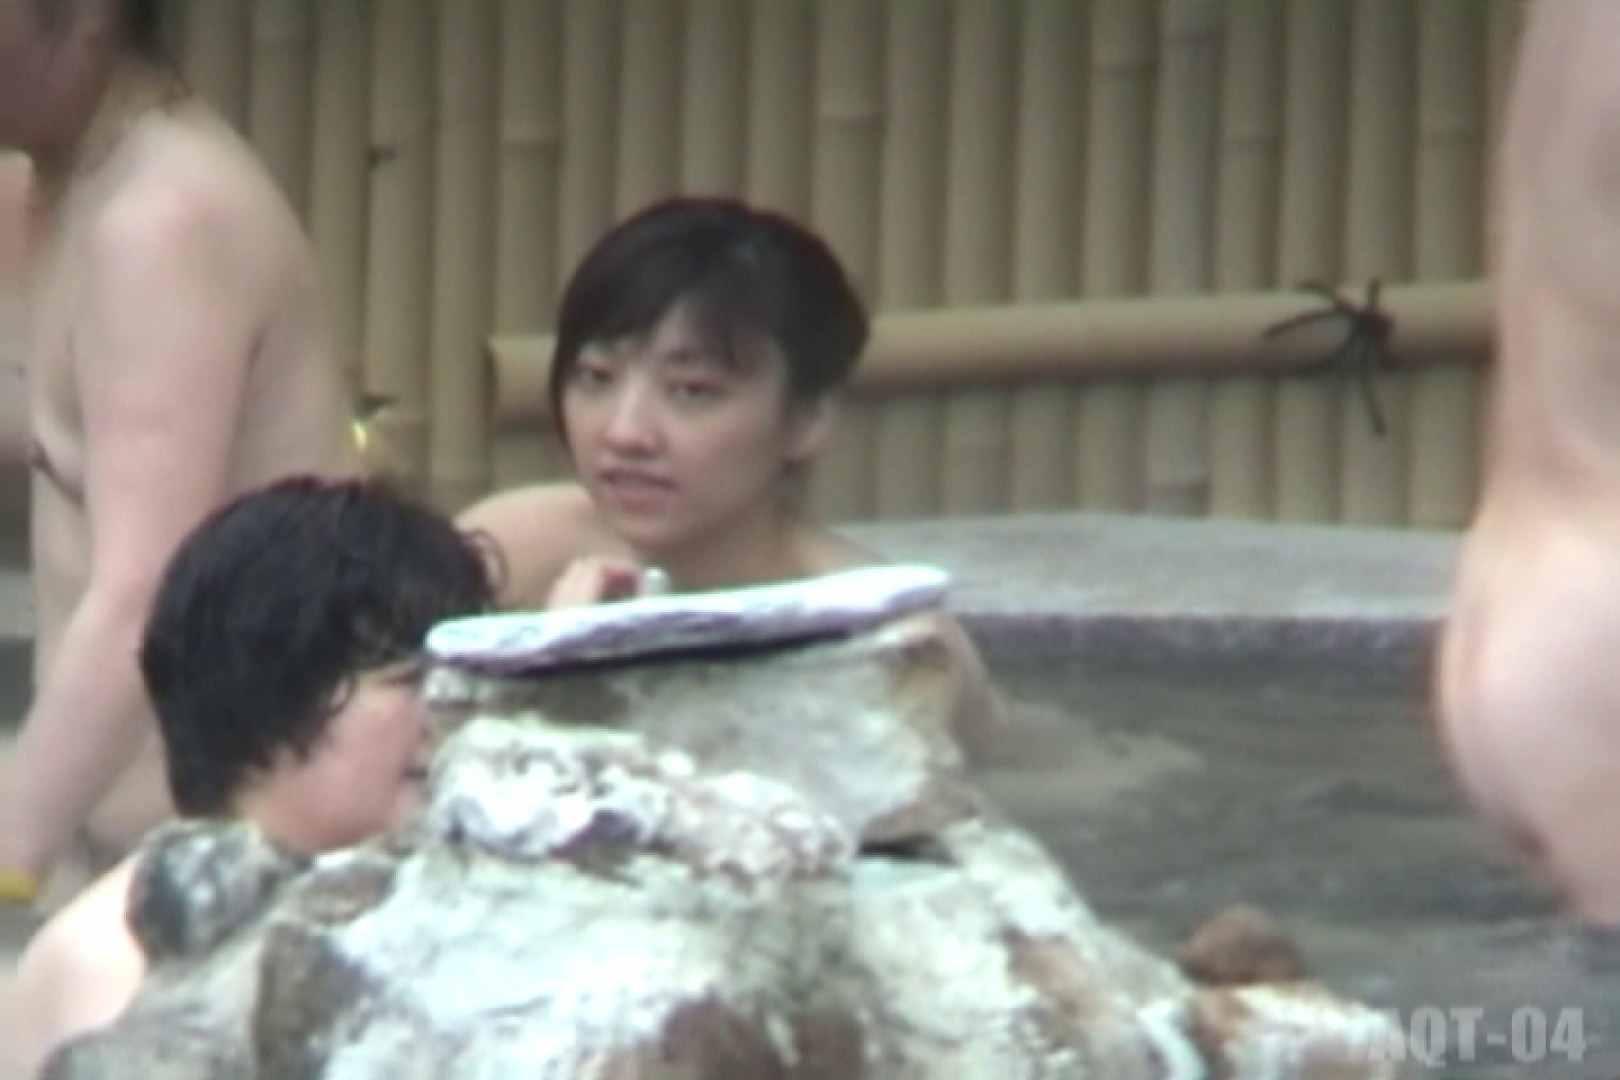 Aquaな露天風呂Vol.743 盗撮特撮 | 露天  12pic 1